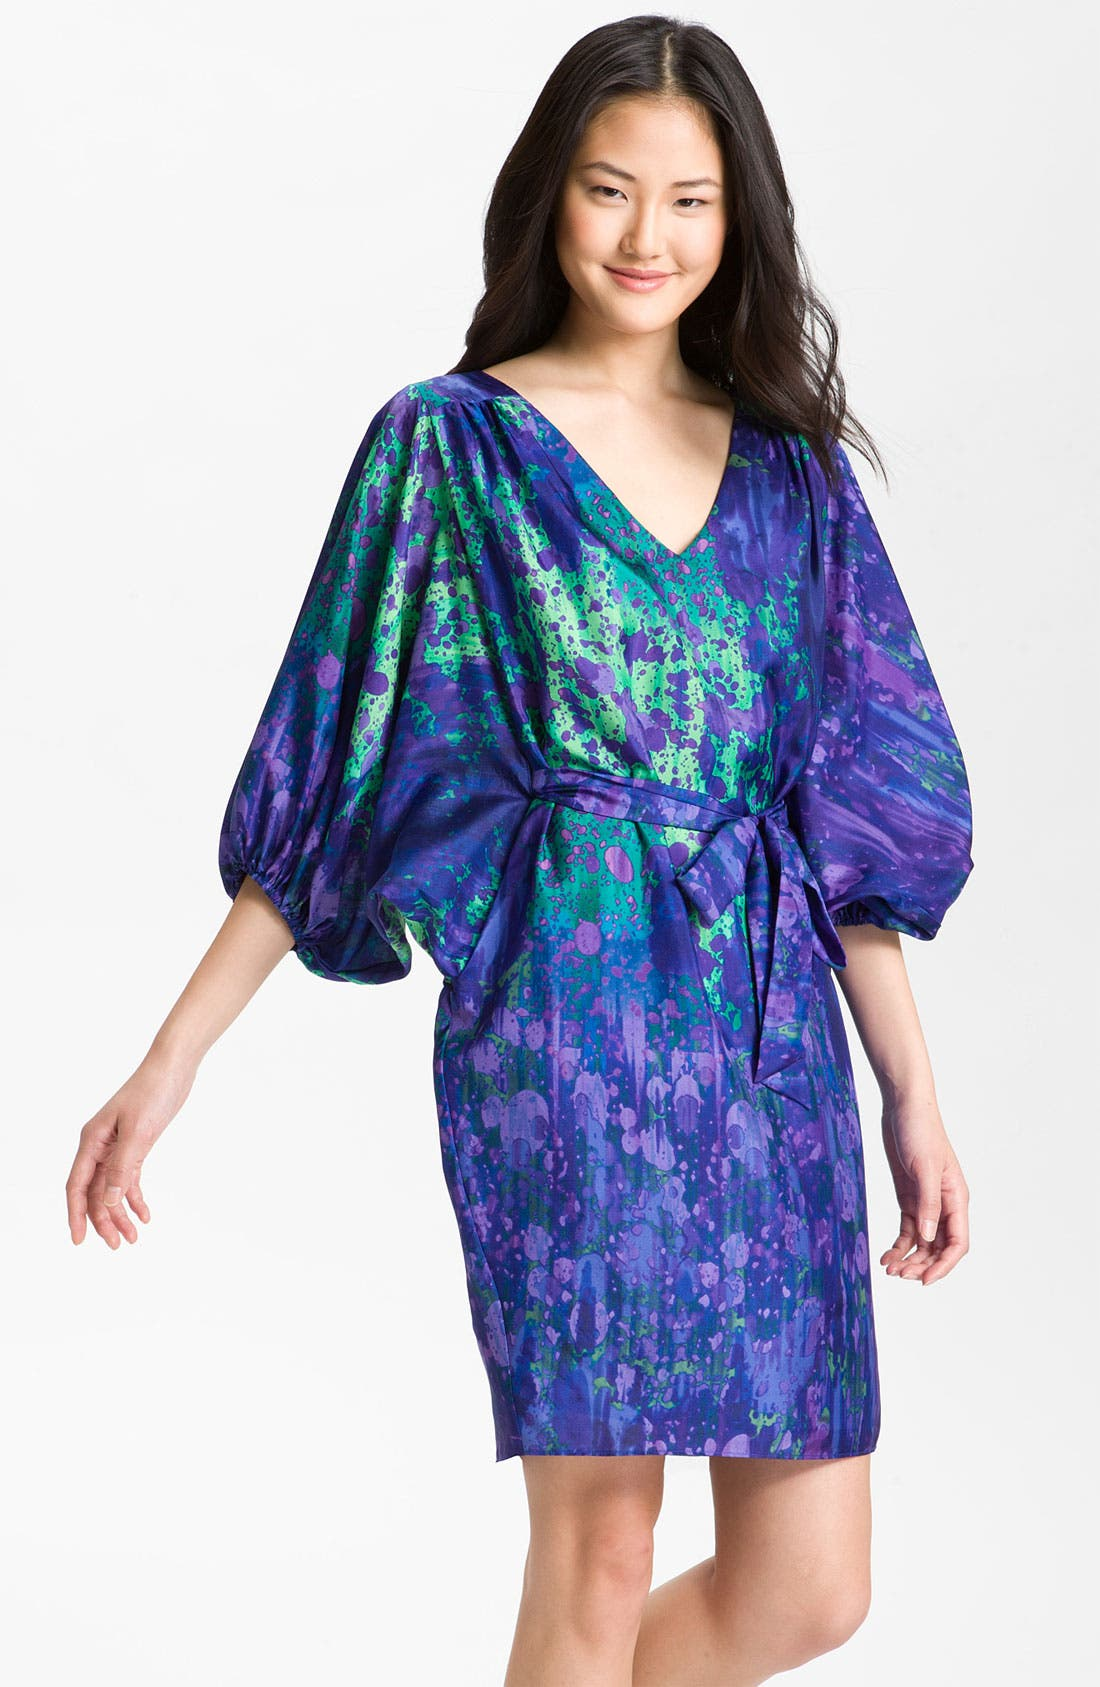 Main Image - Suzi Chin for Maggy Boutique Blouson Silk Charmeuse Dress